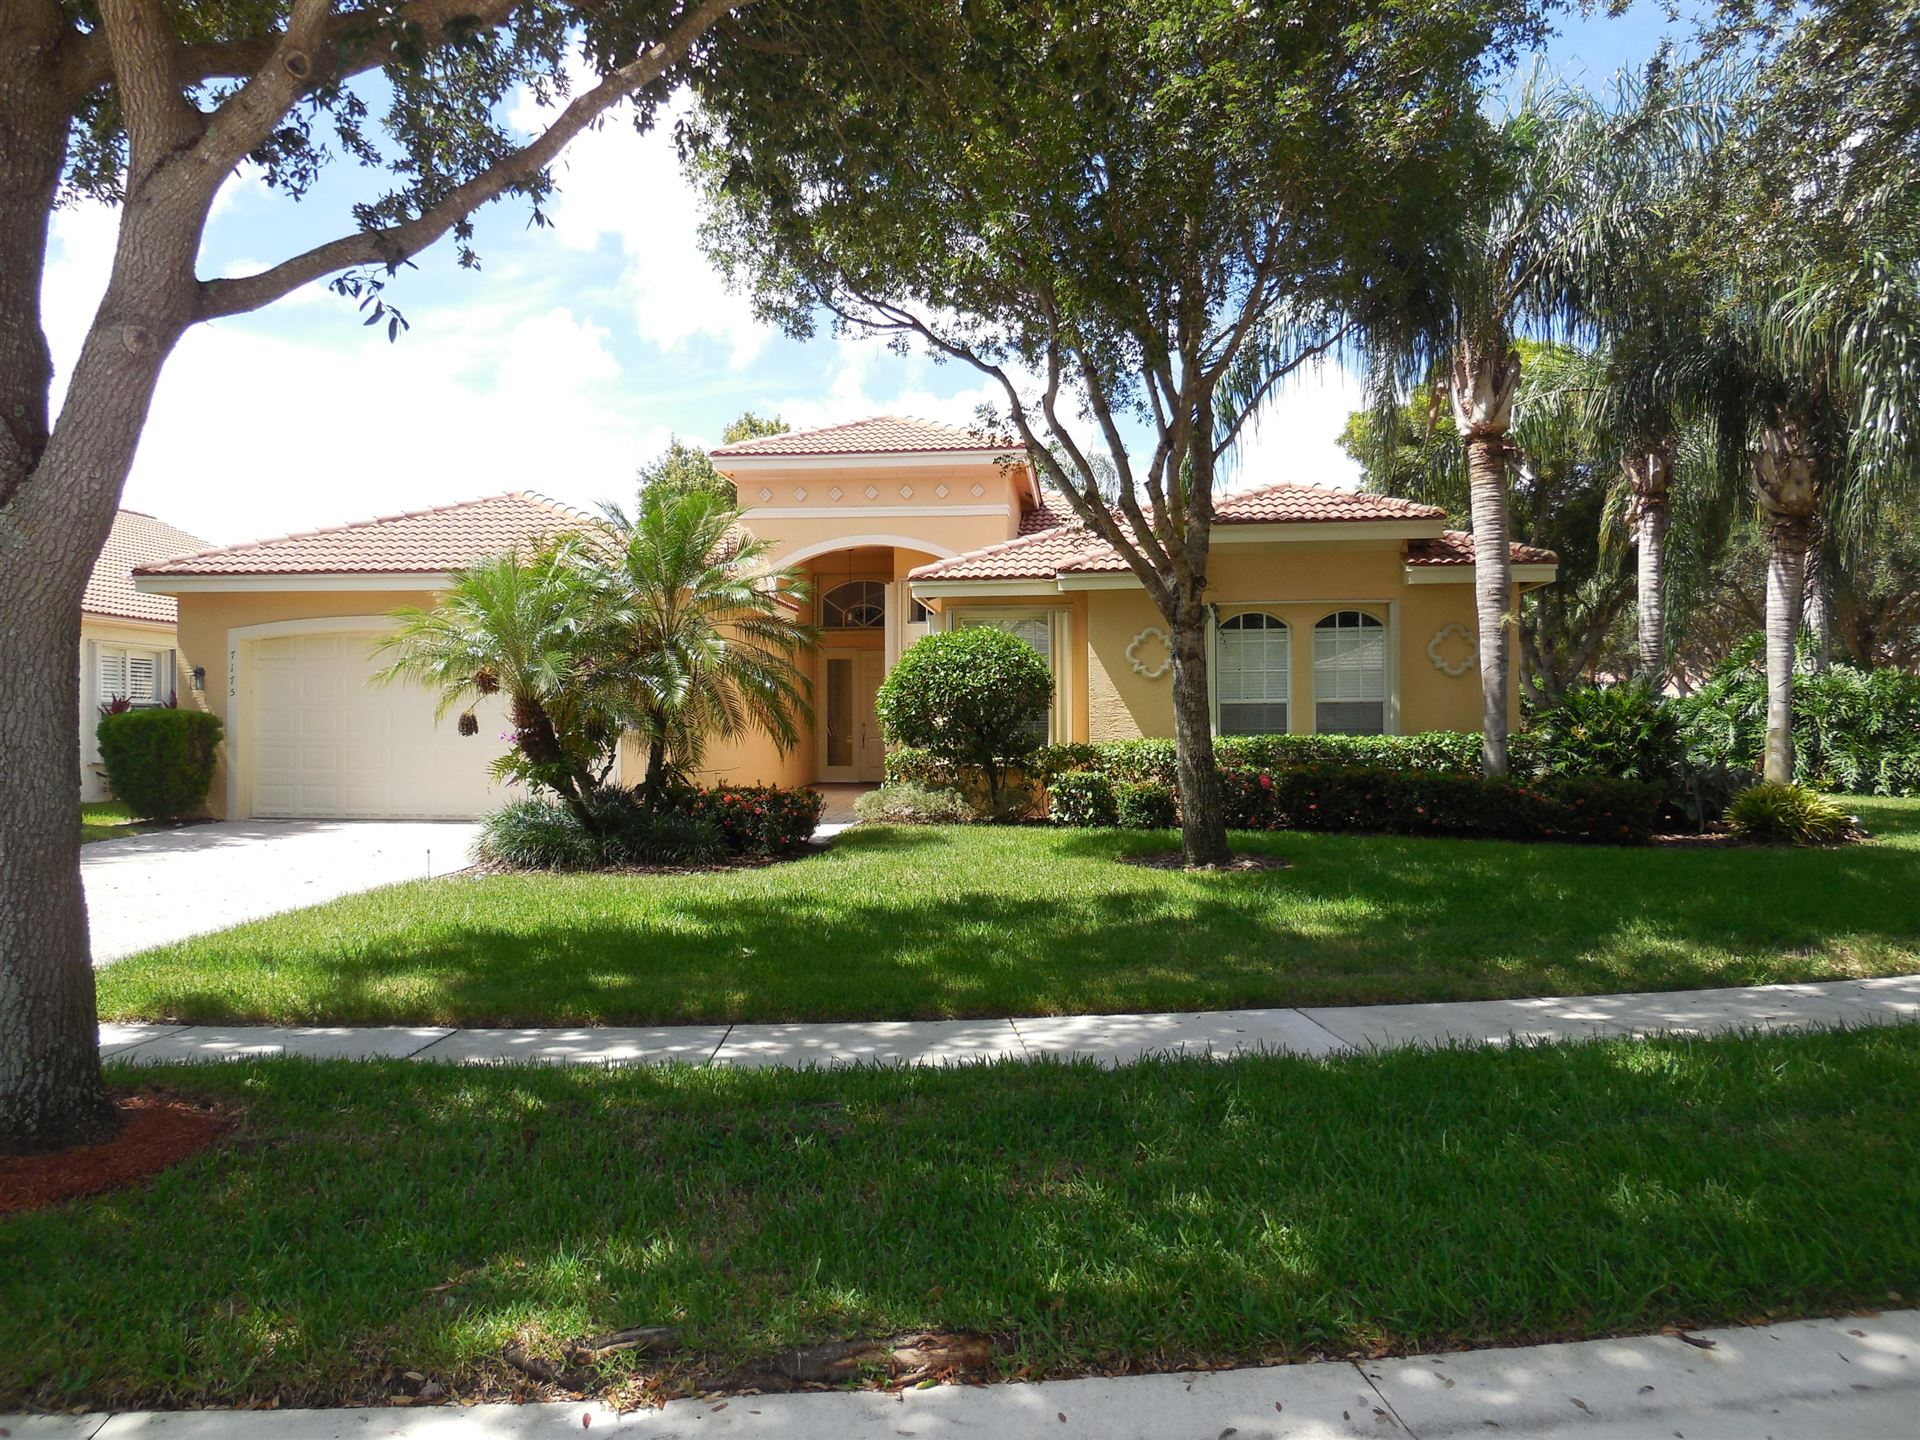 7175 Great Falls Circle, Boynton Beach, FL 33437 - MLS#: RX-10738203